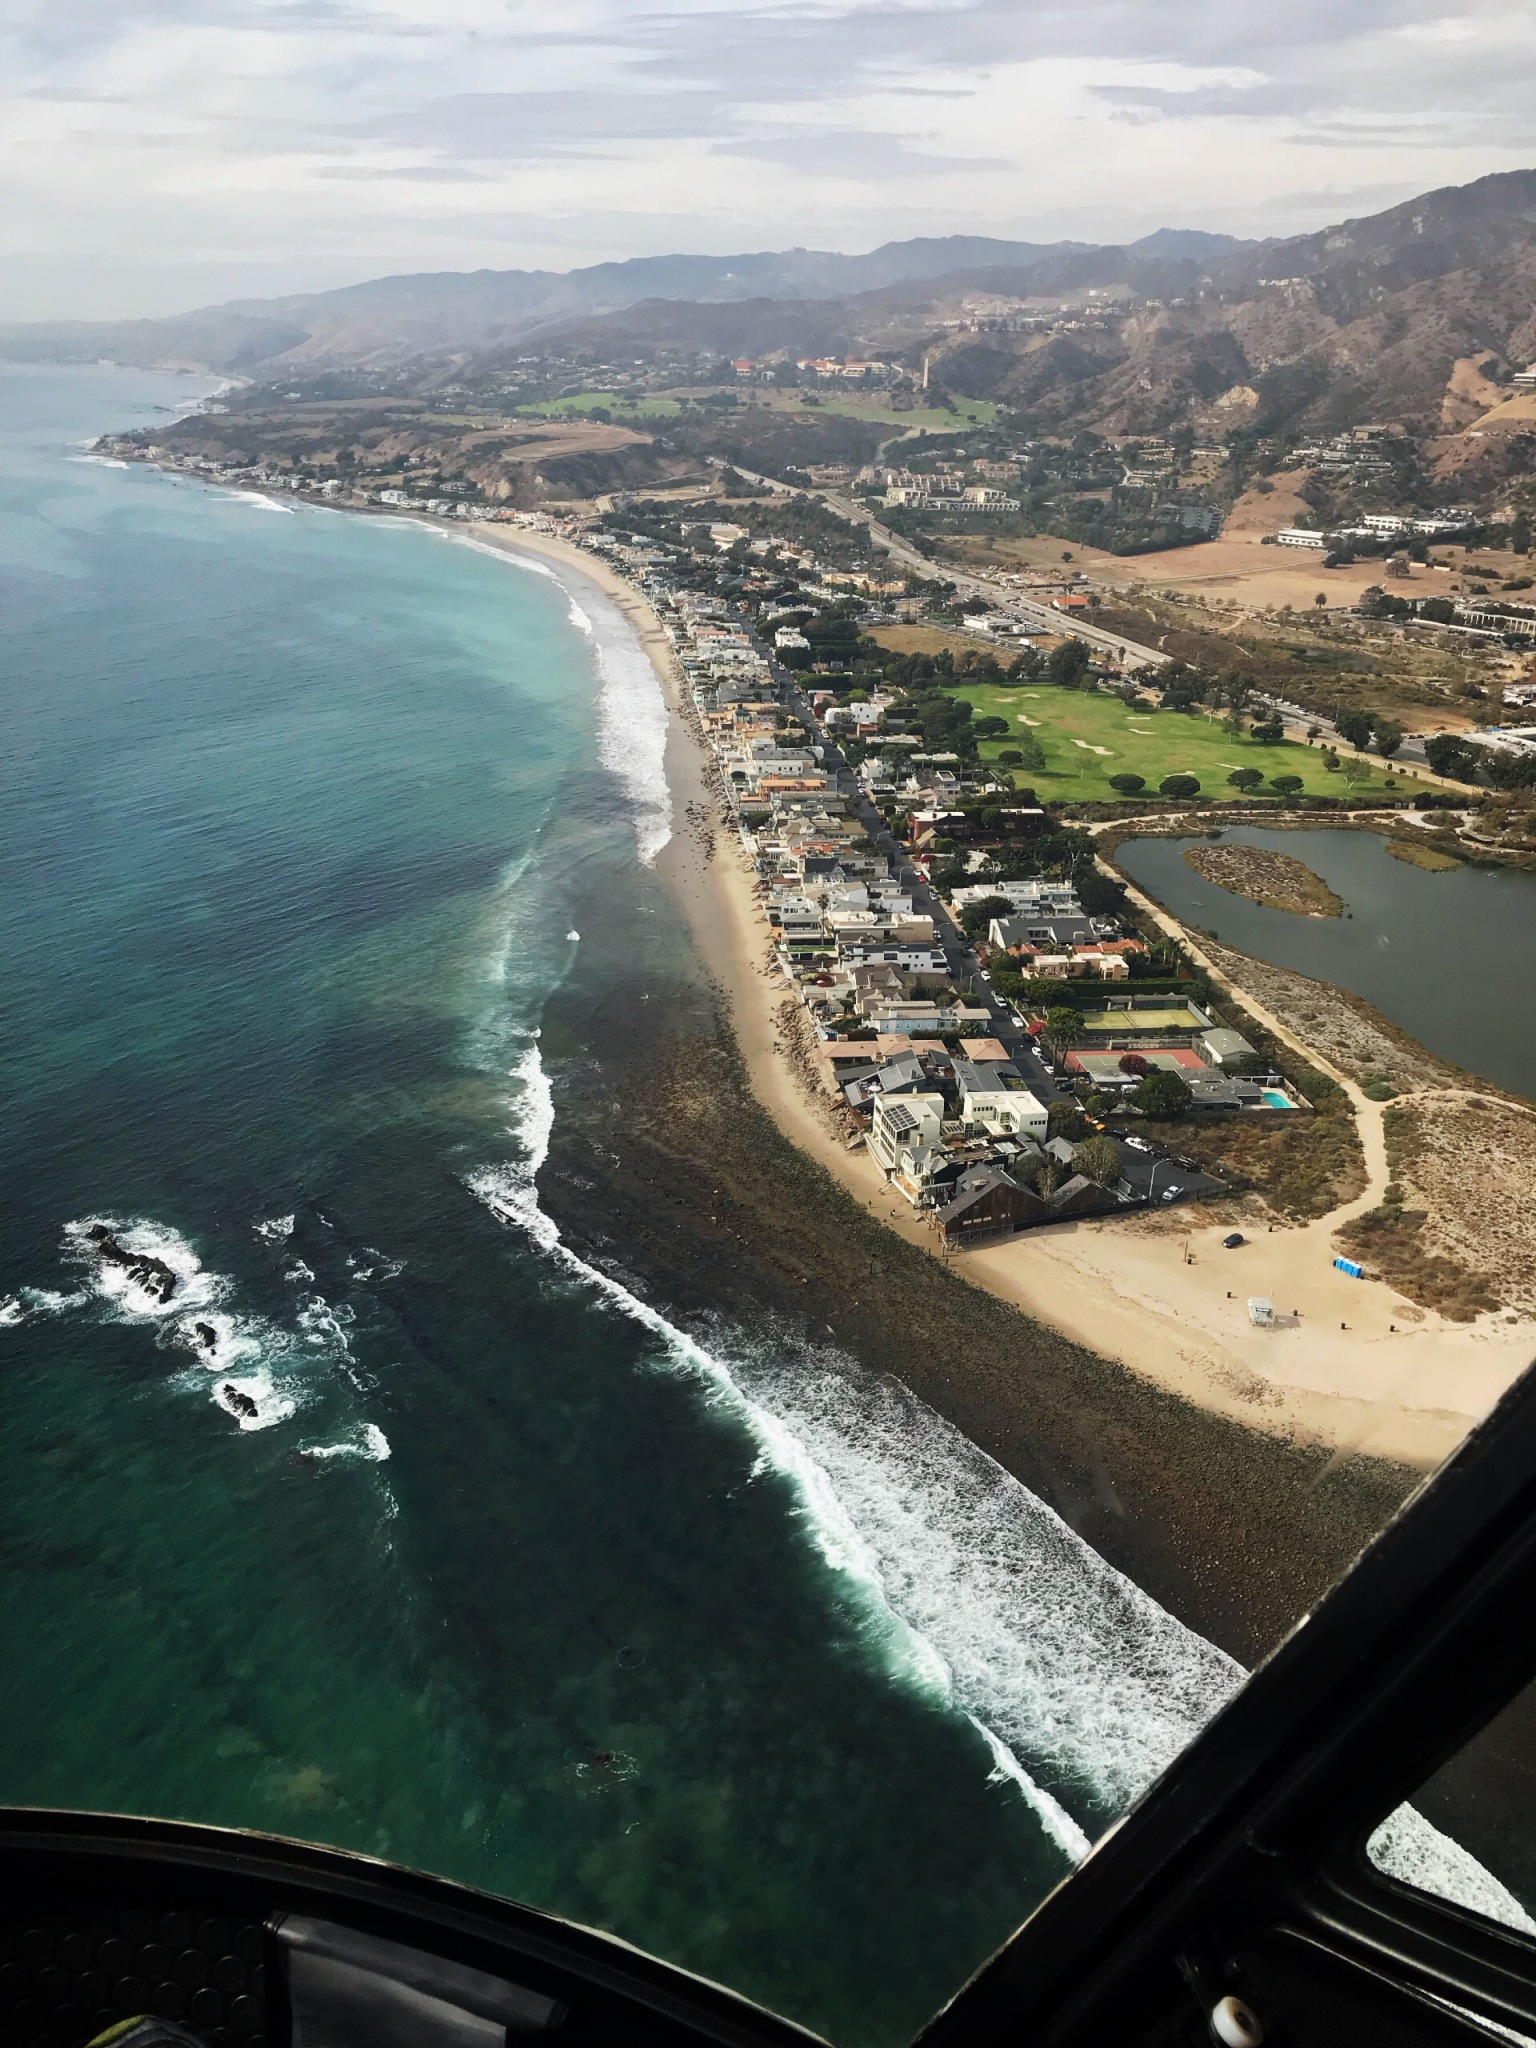 Malibu helicopter view 3